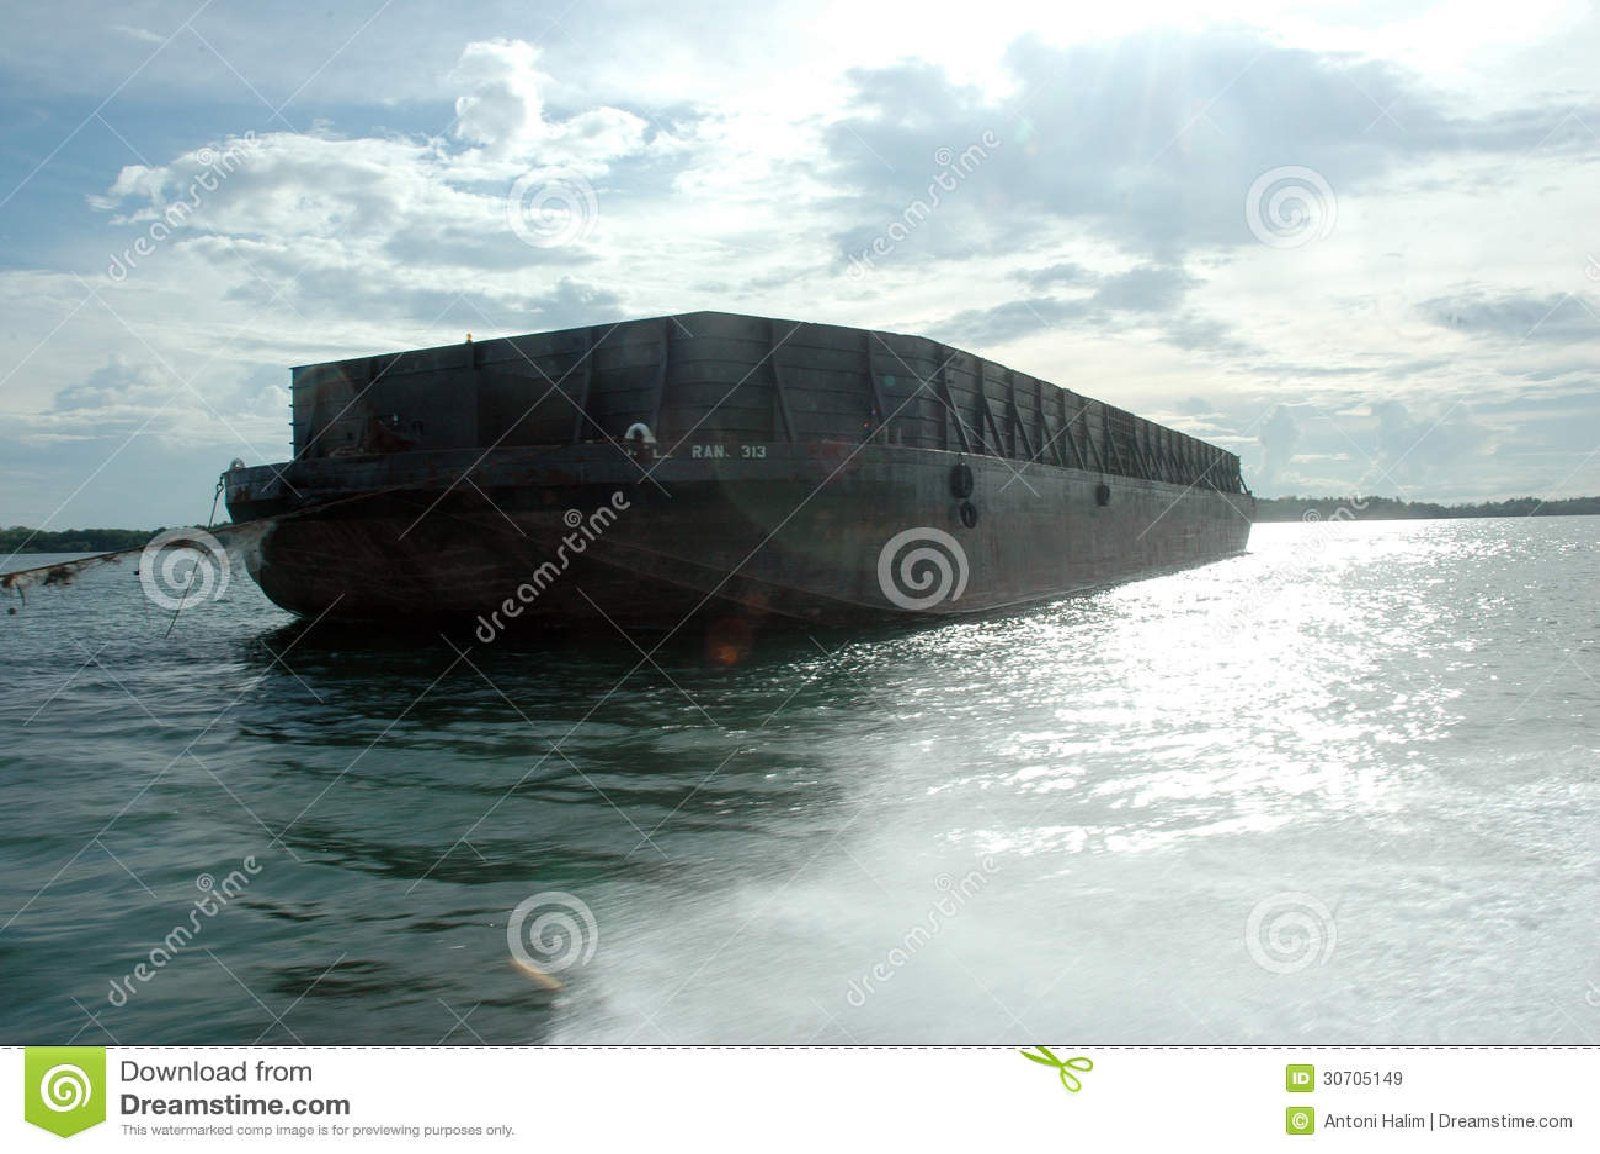 Big Metal Boat Pontoon Royalty Free Stock Images - Image: 30705149